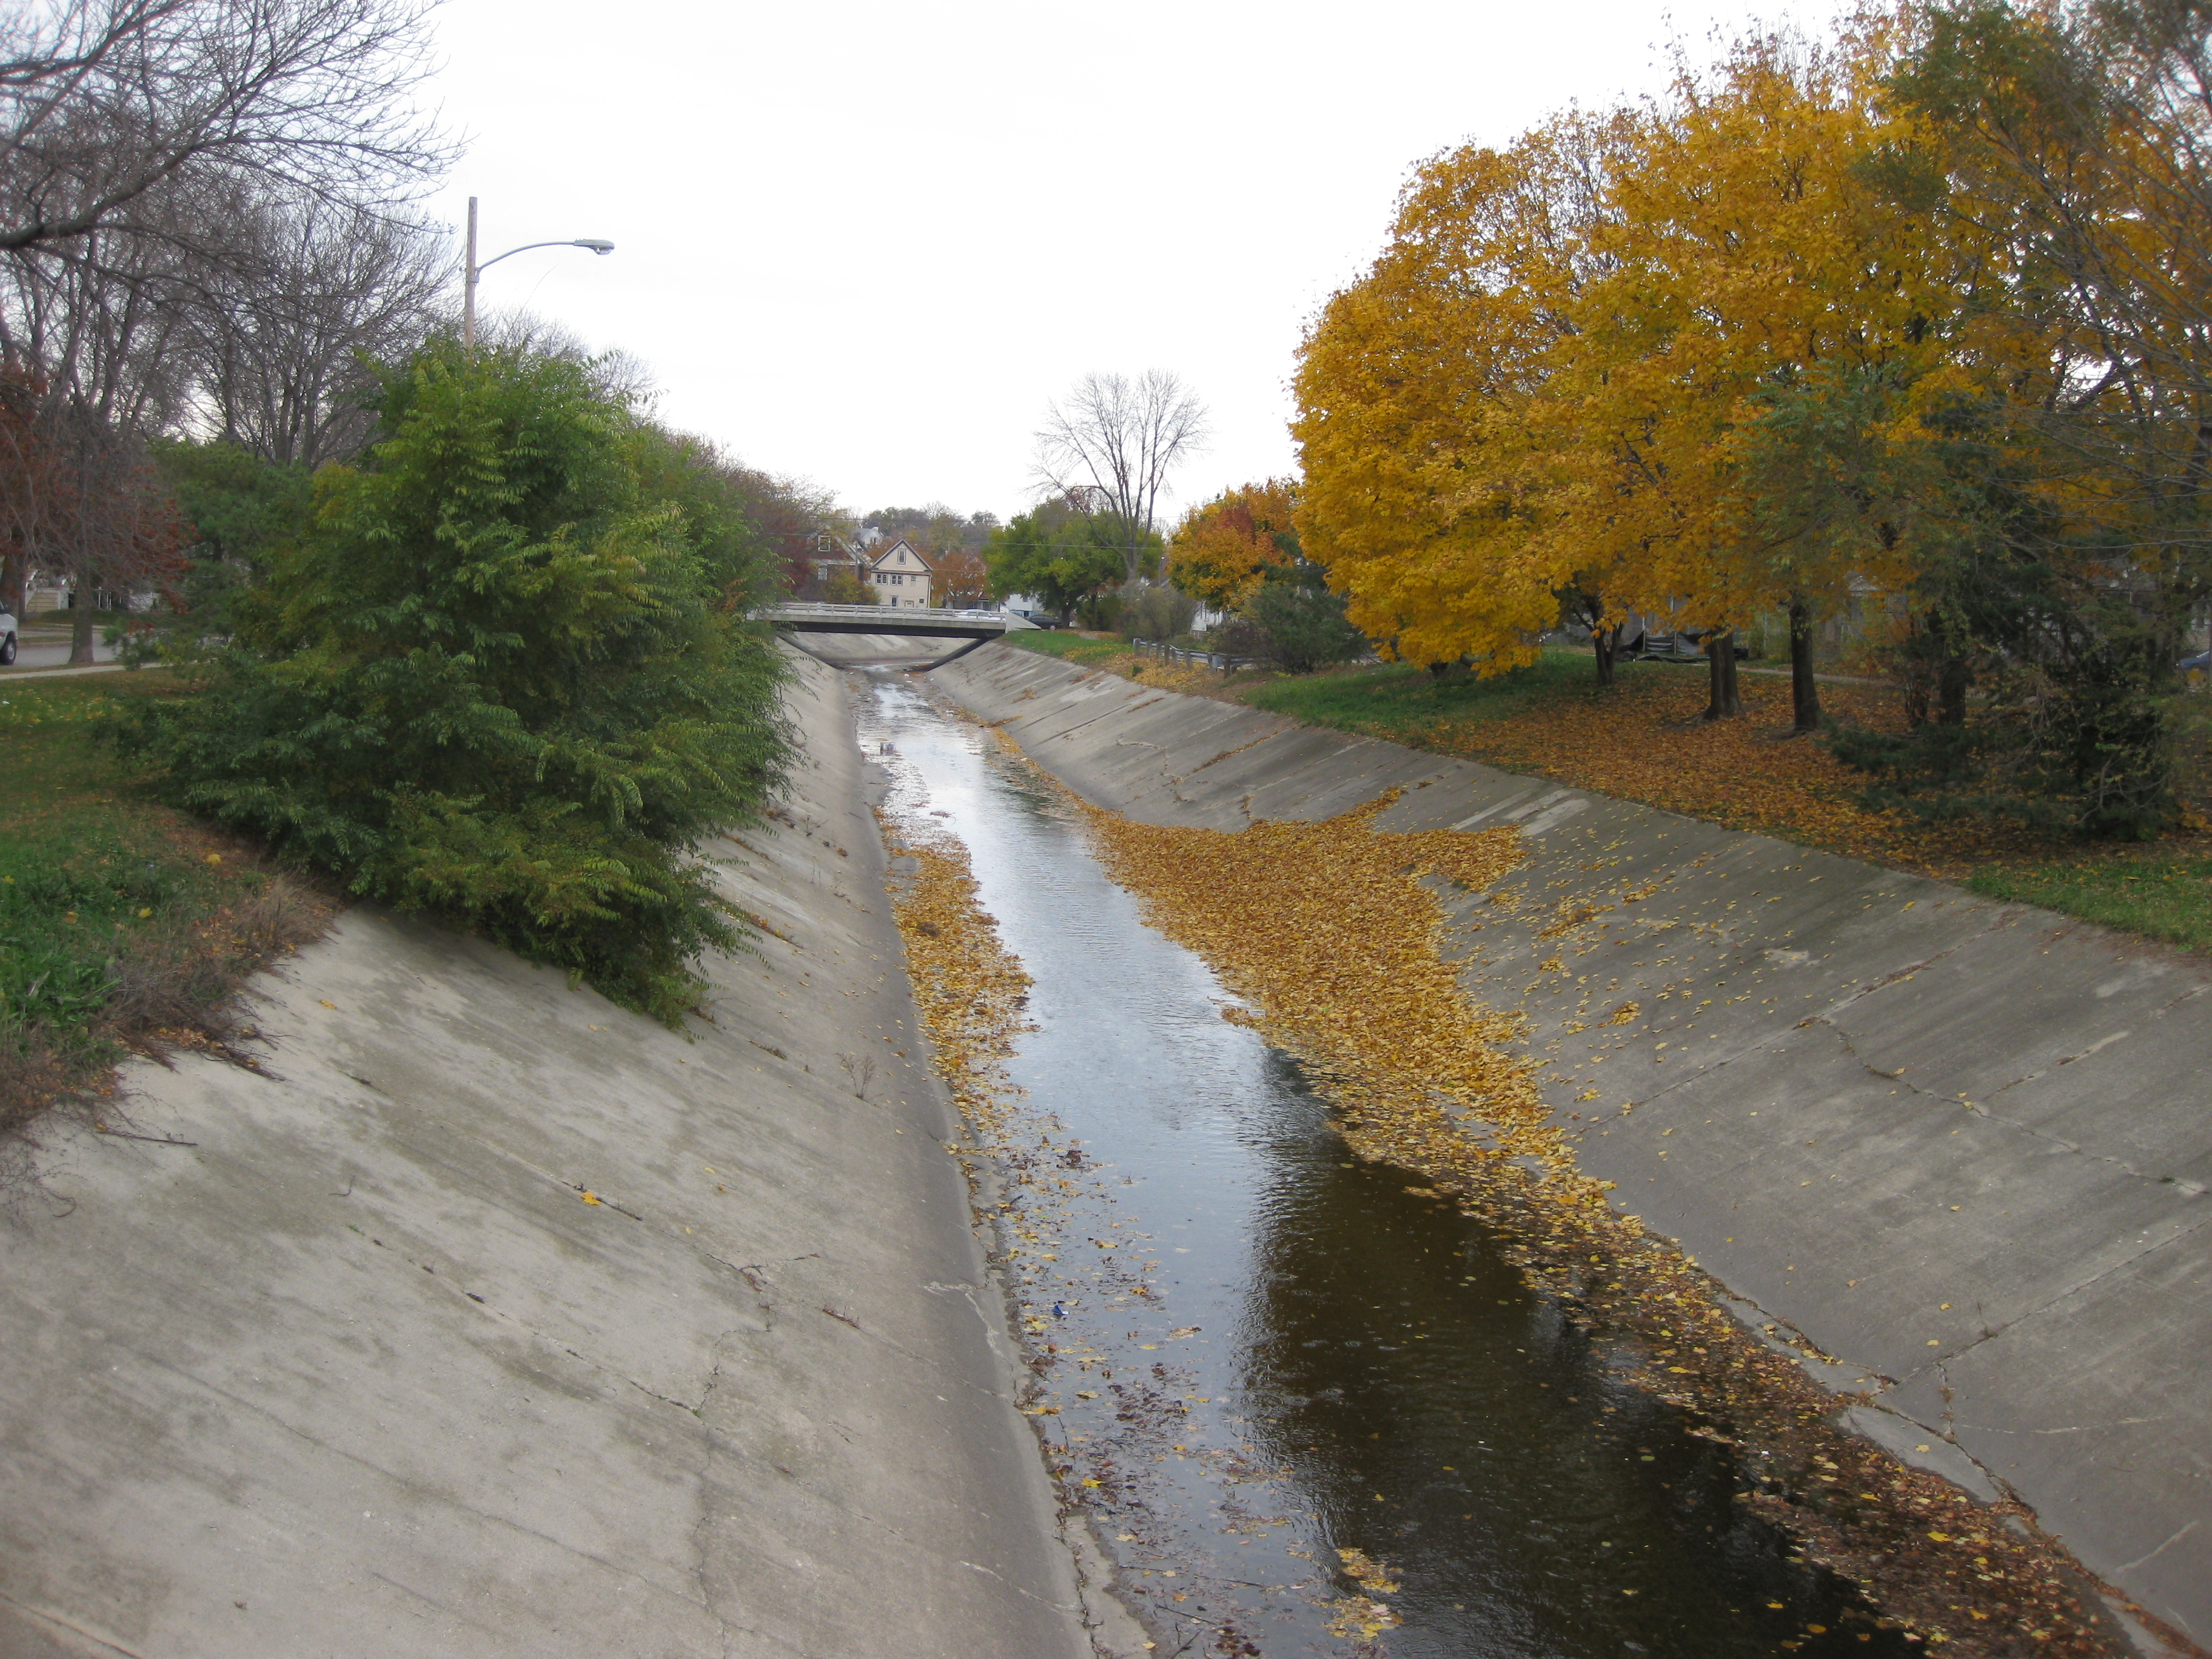 File:KK River Channel.jpg - Wikimedia Commons